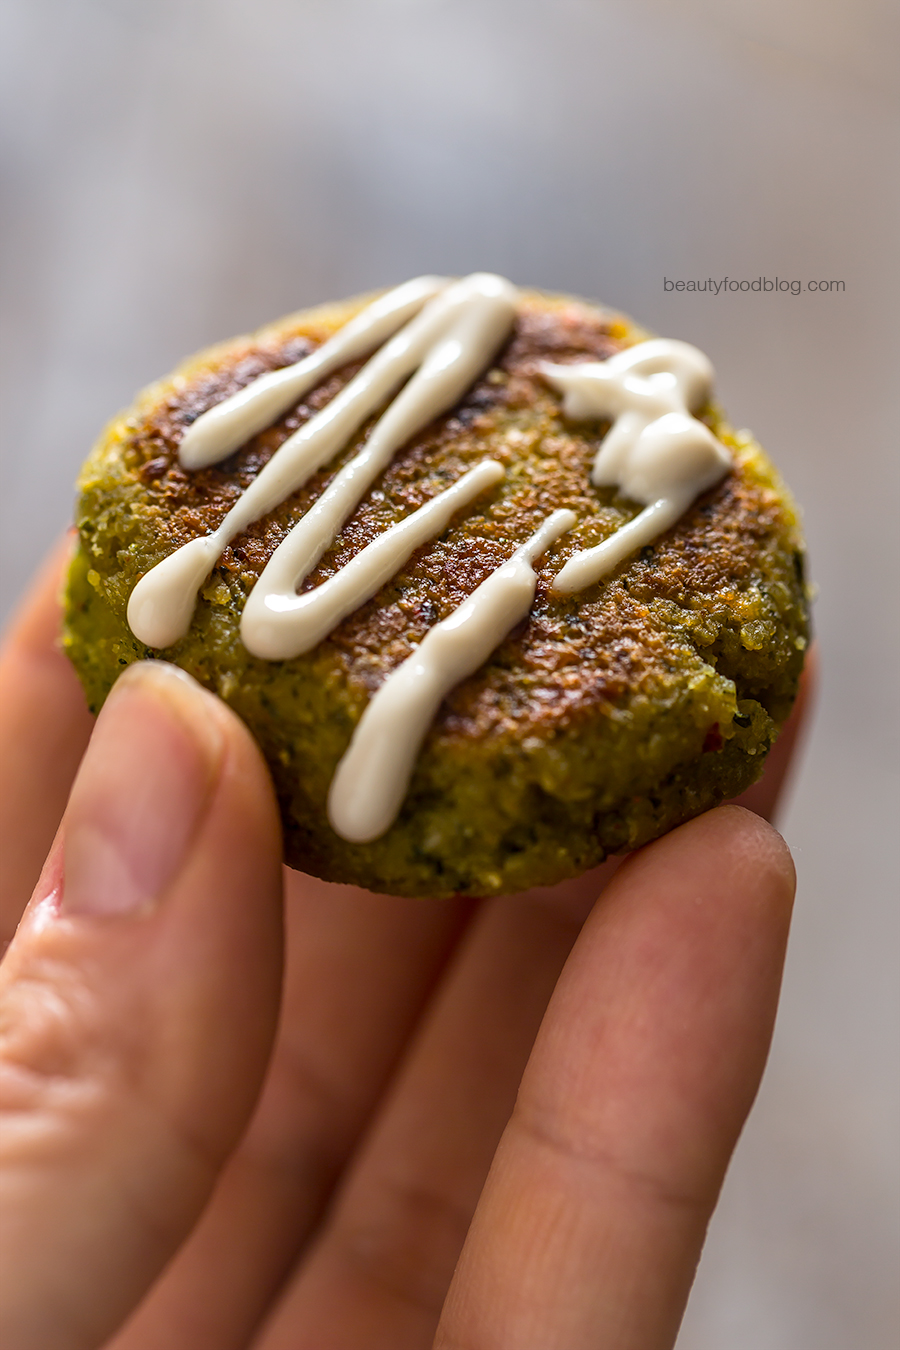 vegan easy falafel with rosemary baked potatoes - ricetta falafel non fritti con patate dolci al forno al rosmarino